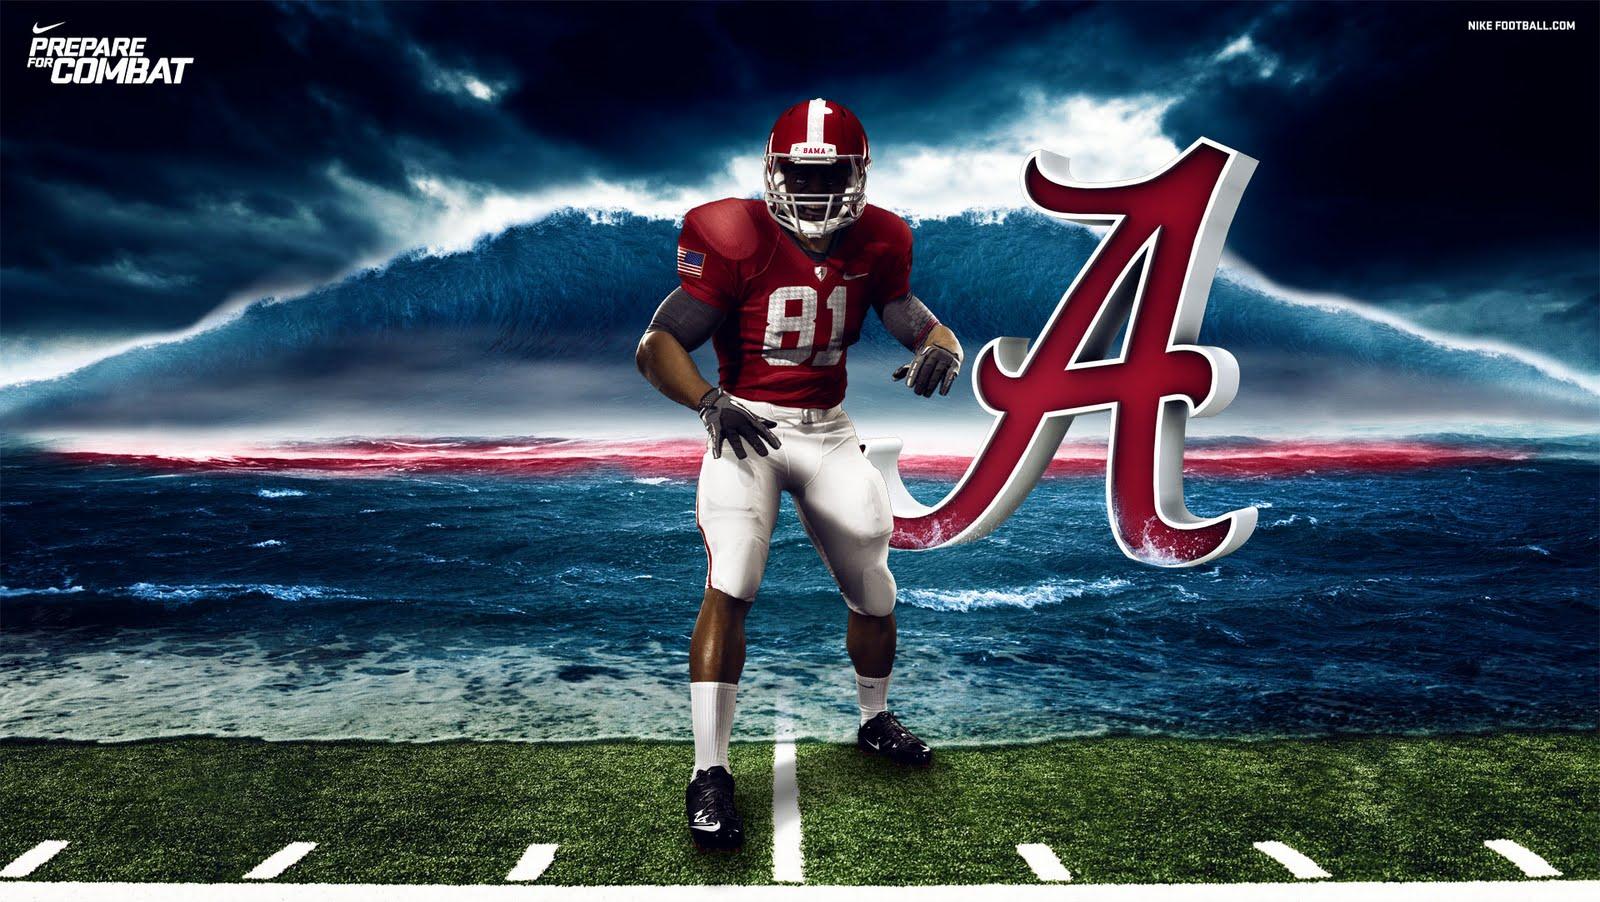 Alabama Football Wallpaper for Samsung Galaxy Note 3 1600x902